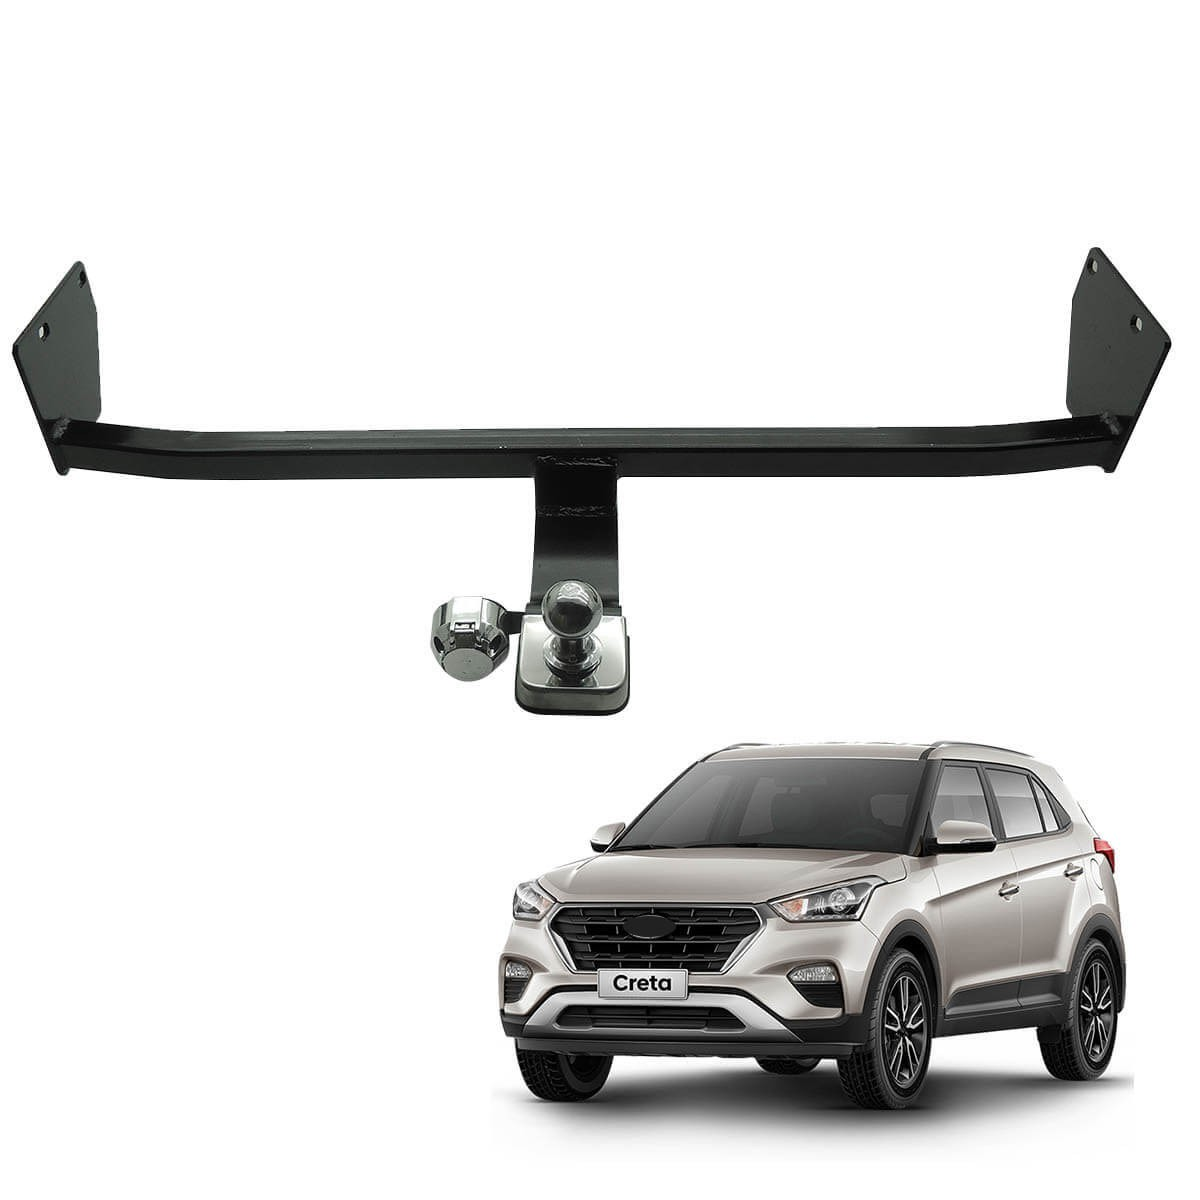 Engate de reboque fixo Hyundai Creta 2017 a 2021